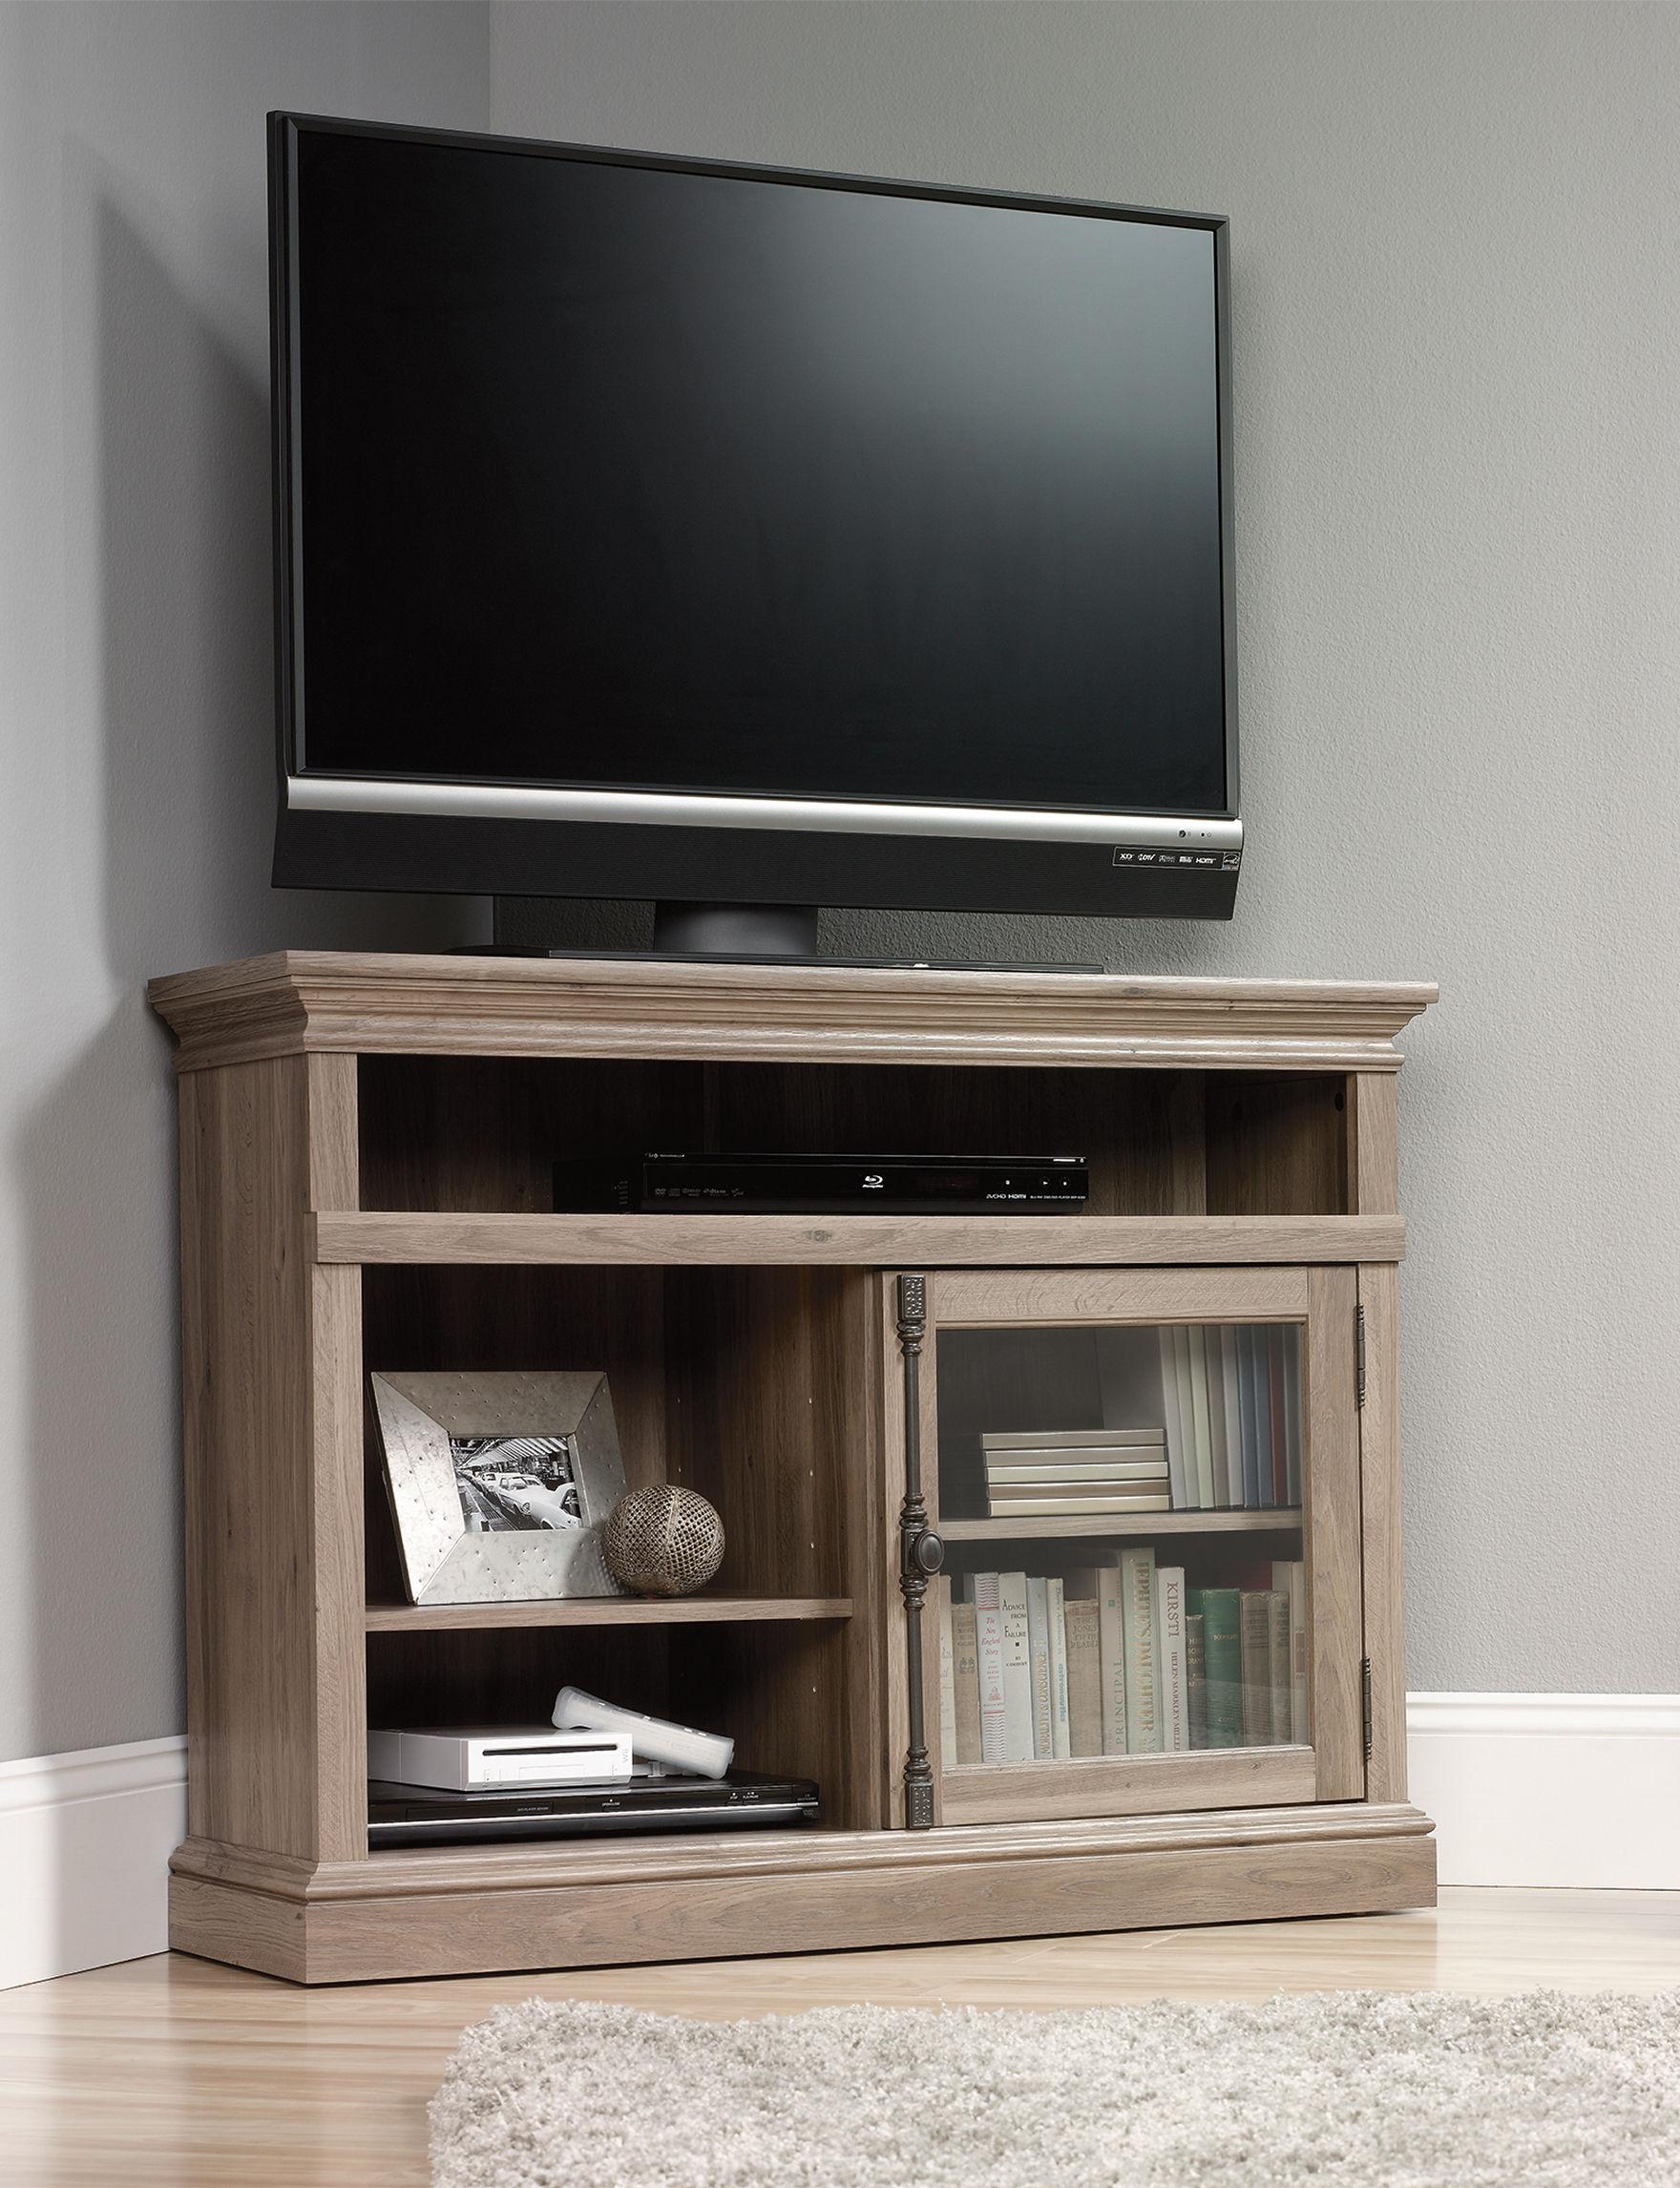 Sauder Beige TV Stands & Entertainment Centers Living Room Furniture